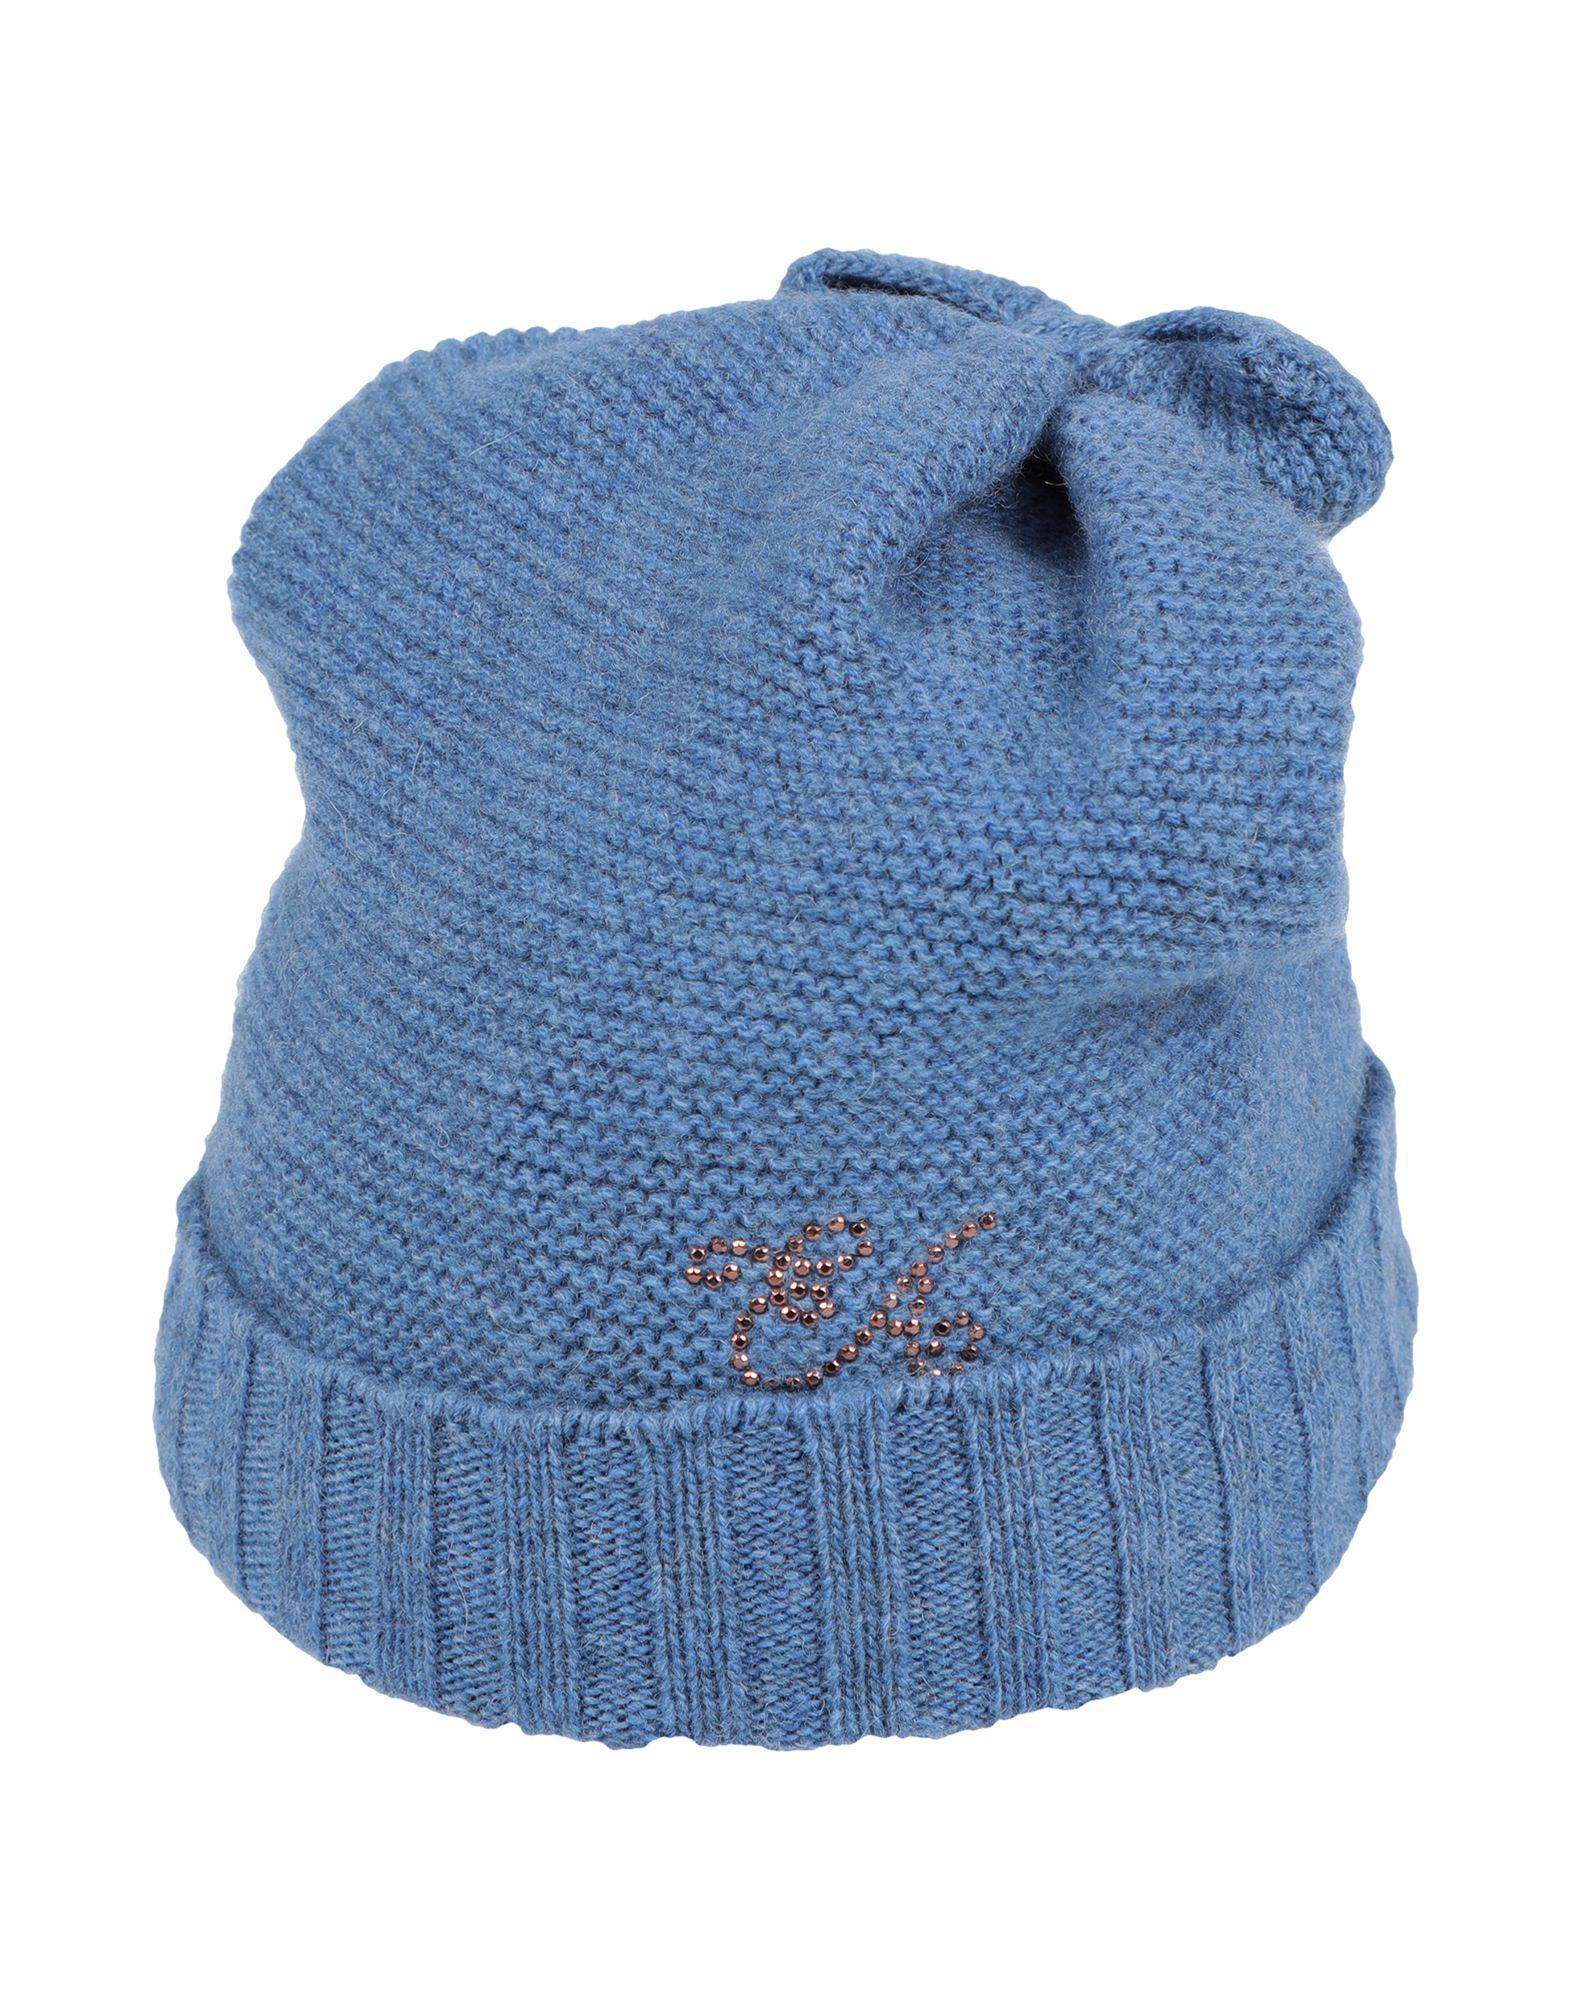 EMPORIO ARMANI Hats - Item 46668425